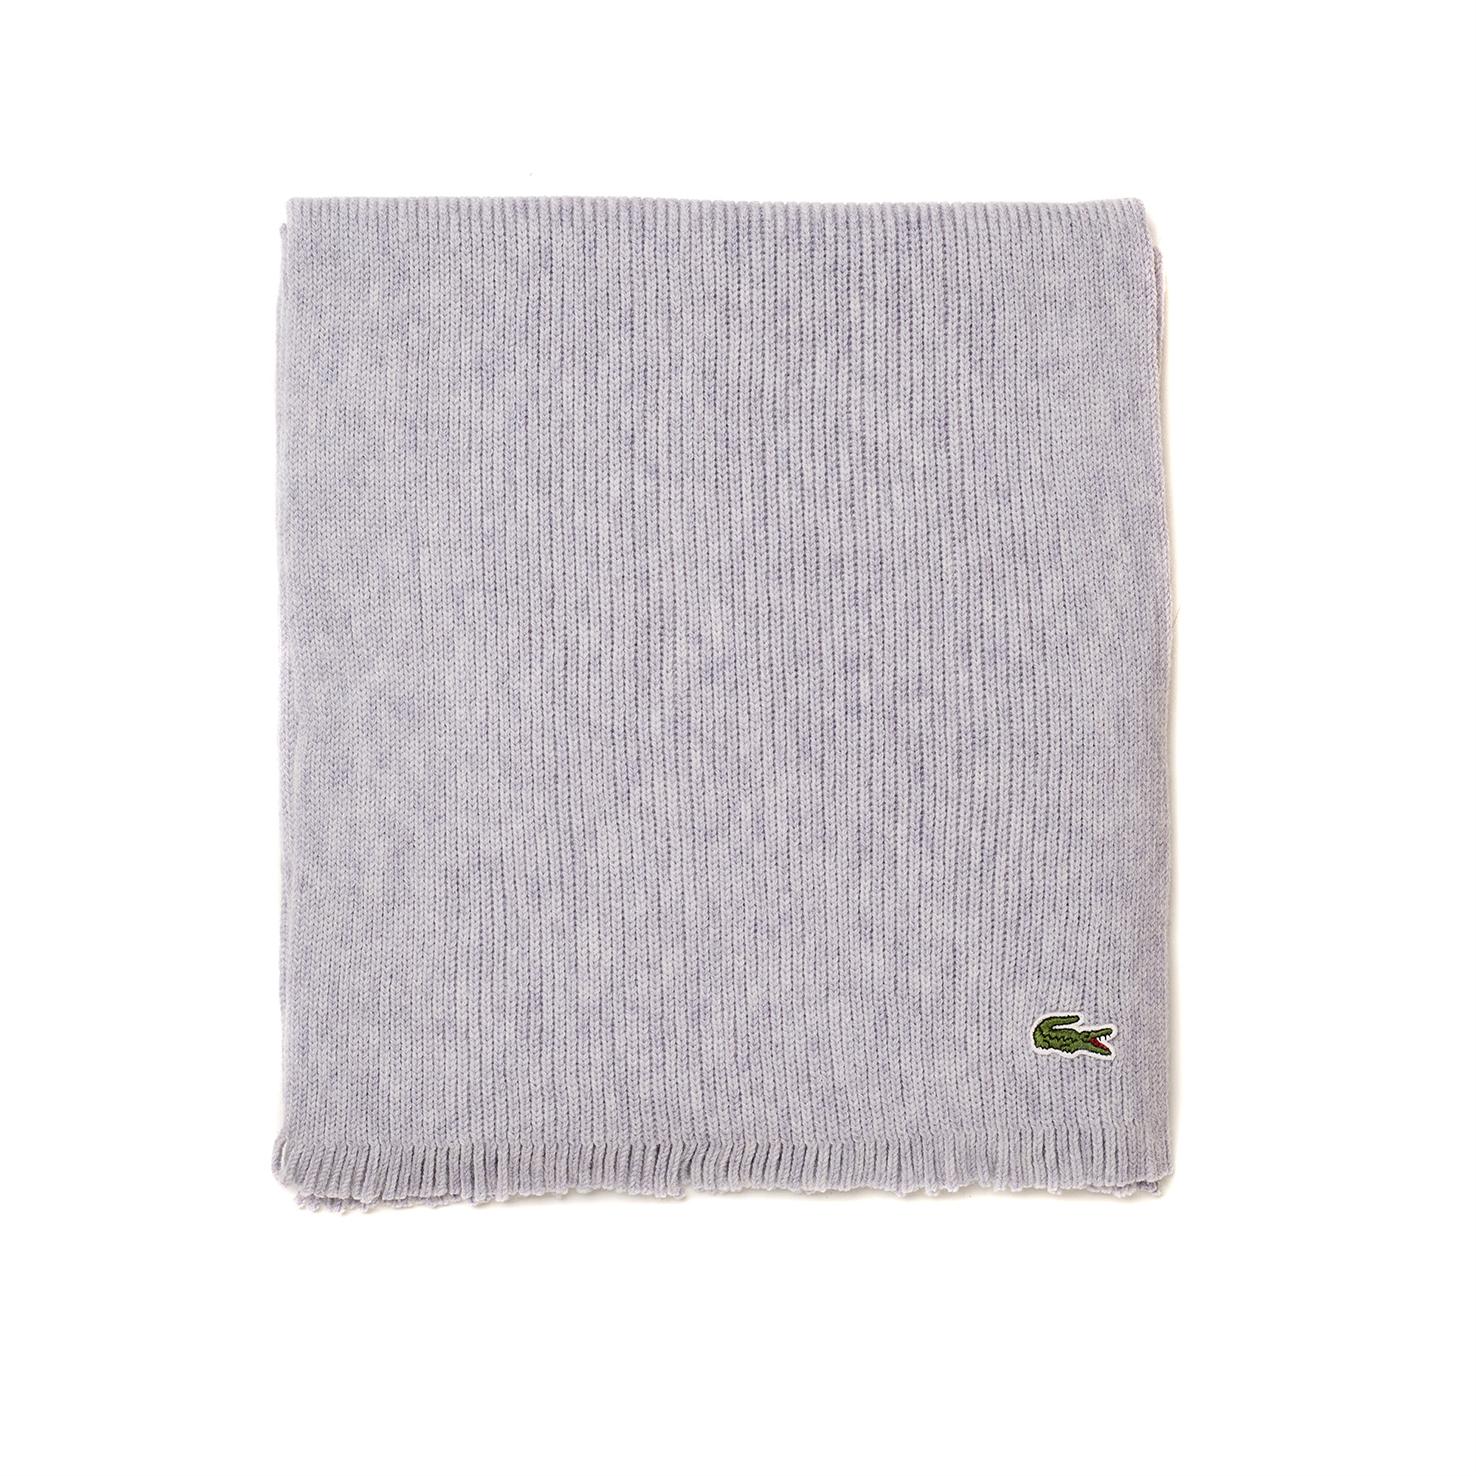 мужской шарф lacoste, серый